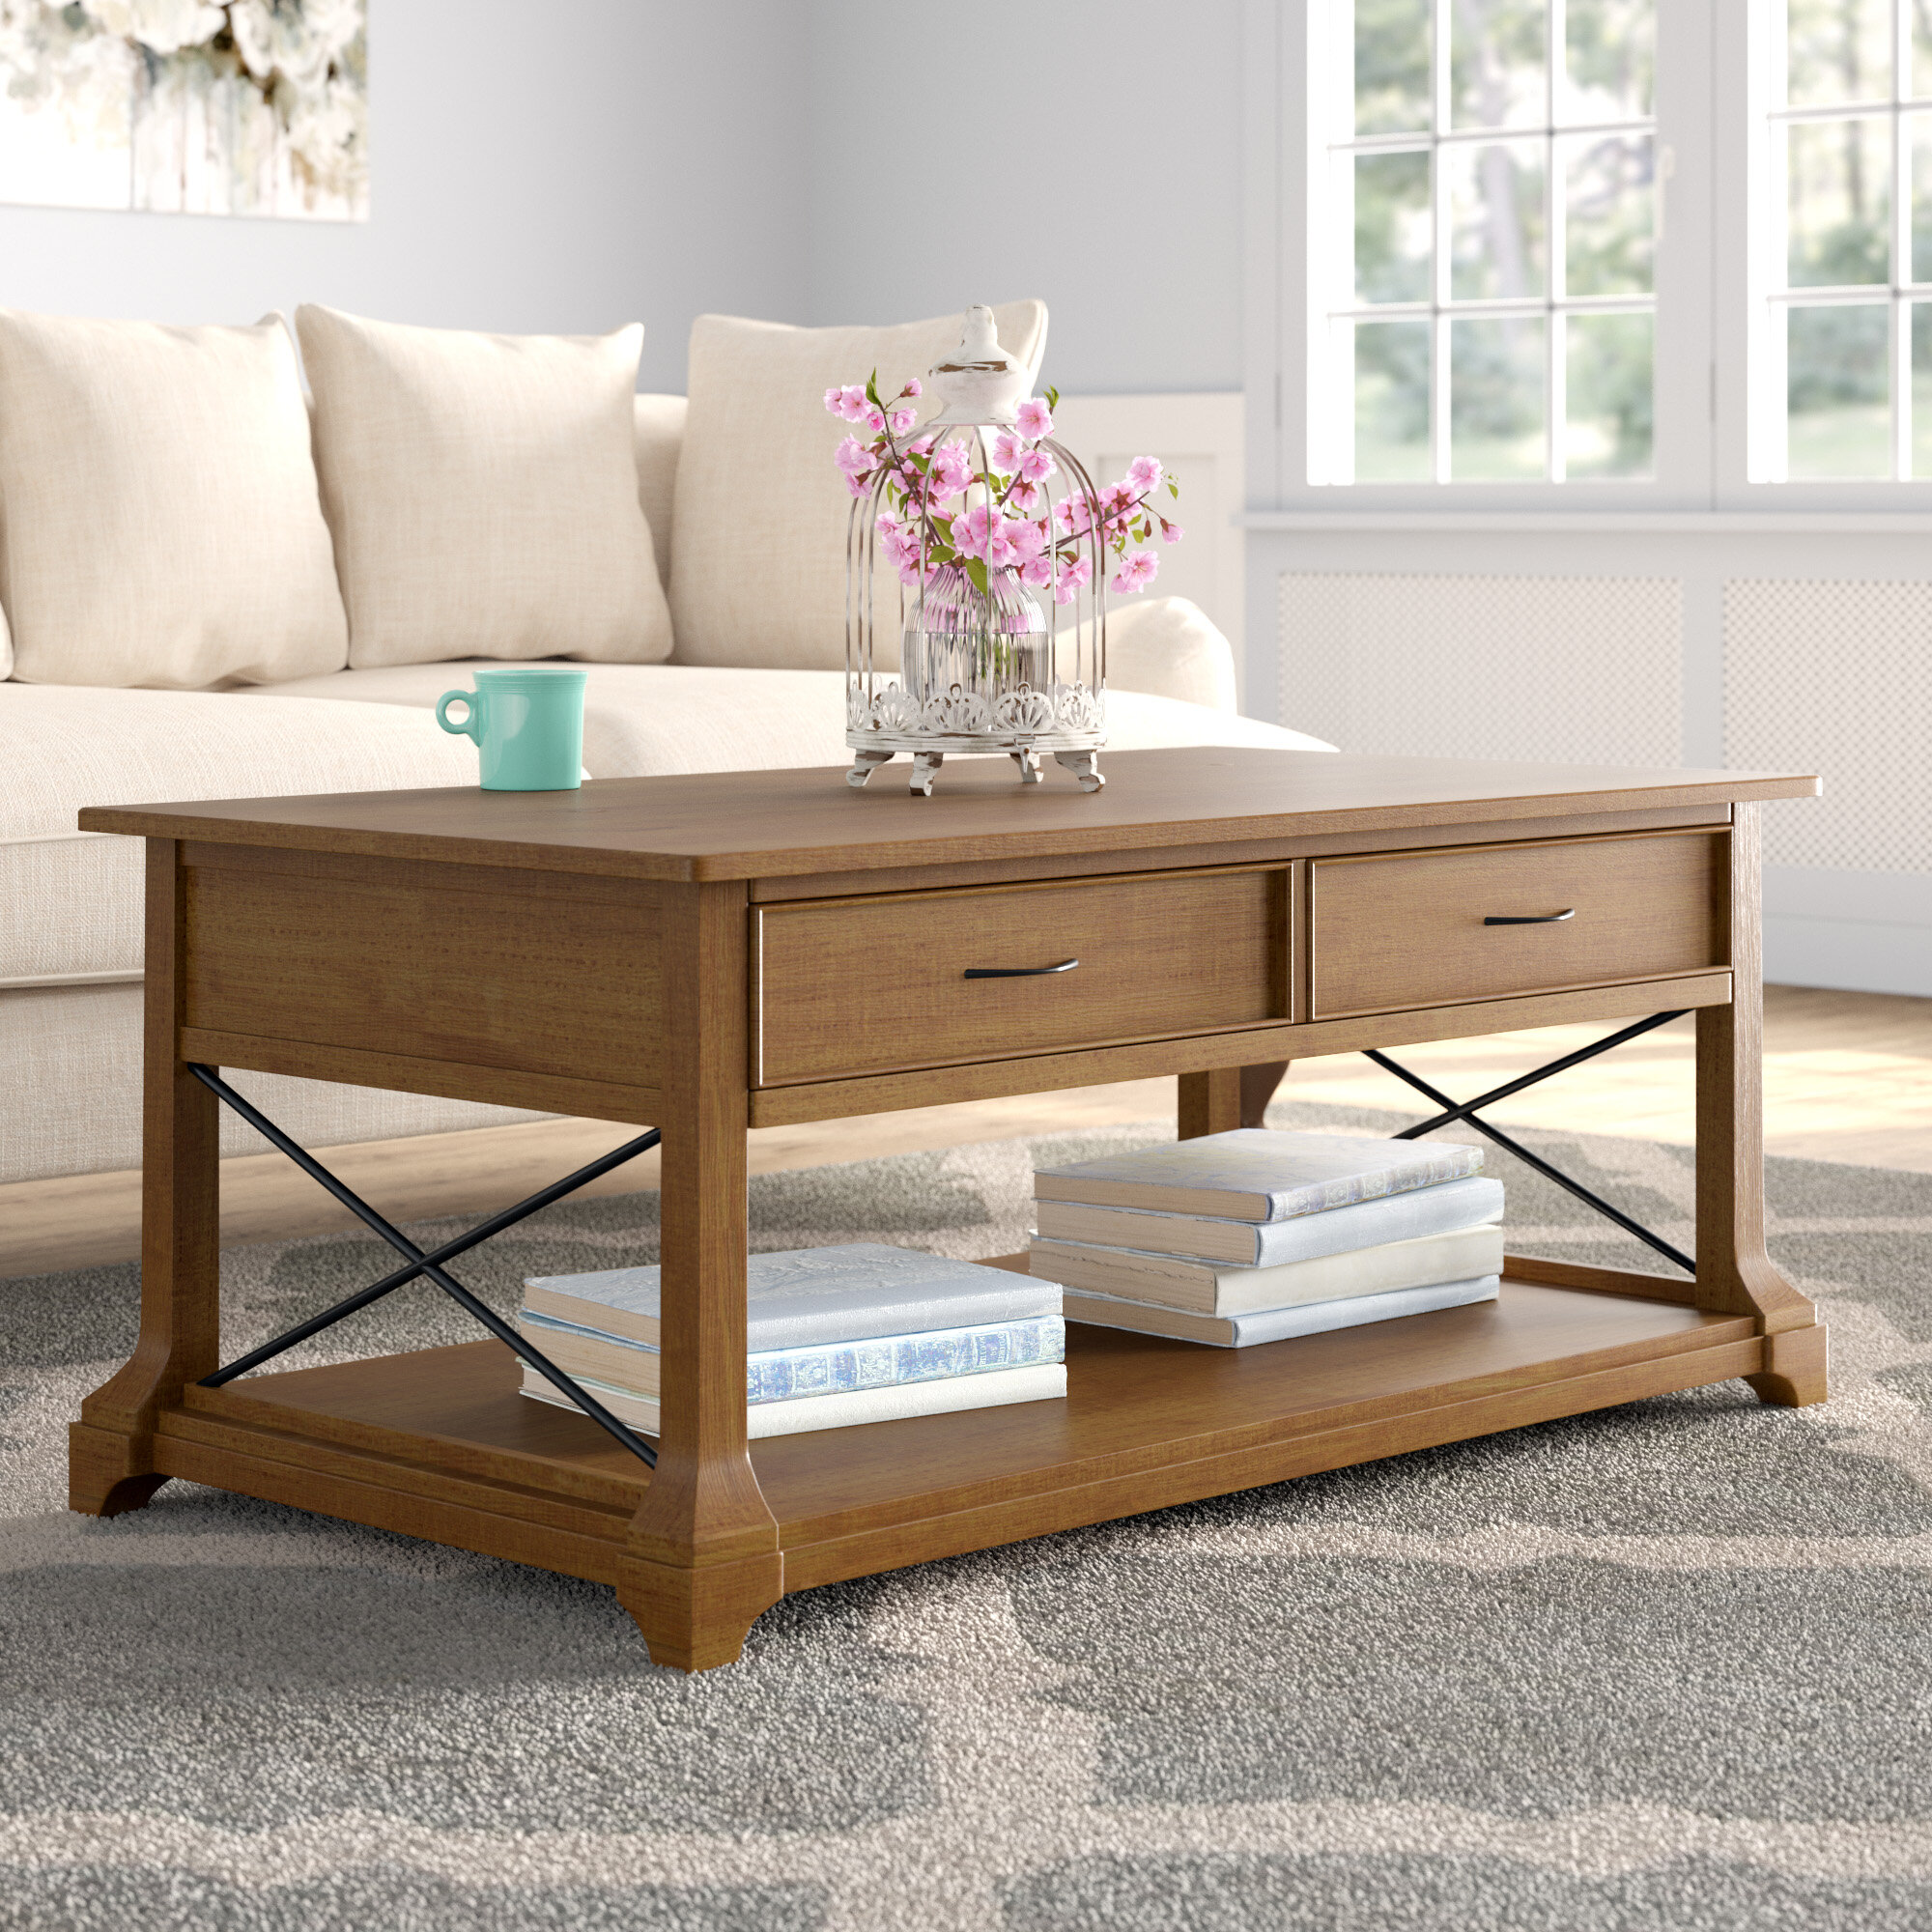 Brilliant Busti Diana Coffee Table Ibusinesslaw Wood Chair Design Ideas Ibusinesslaworg